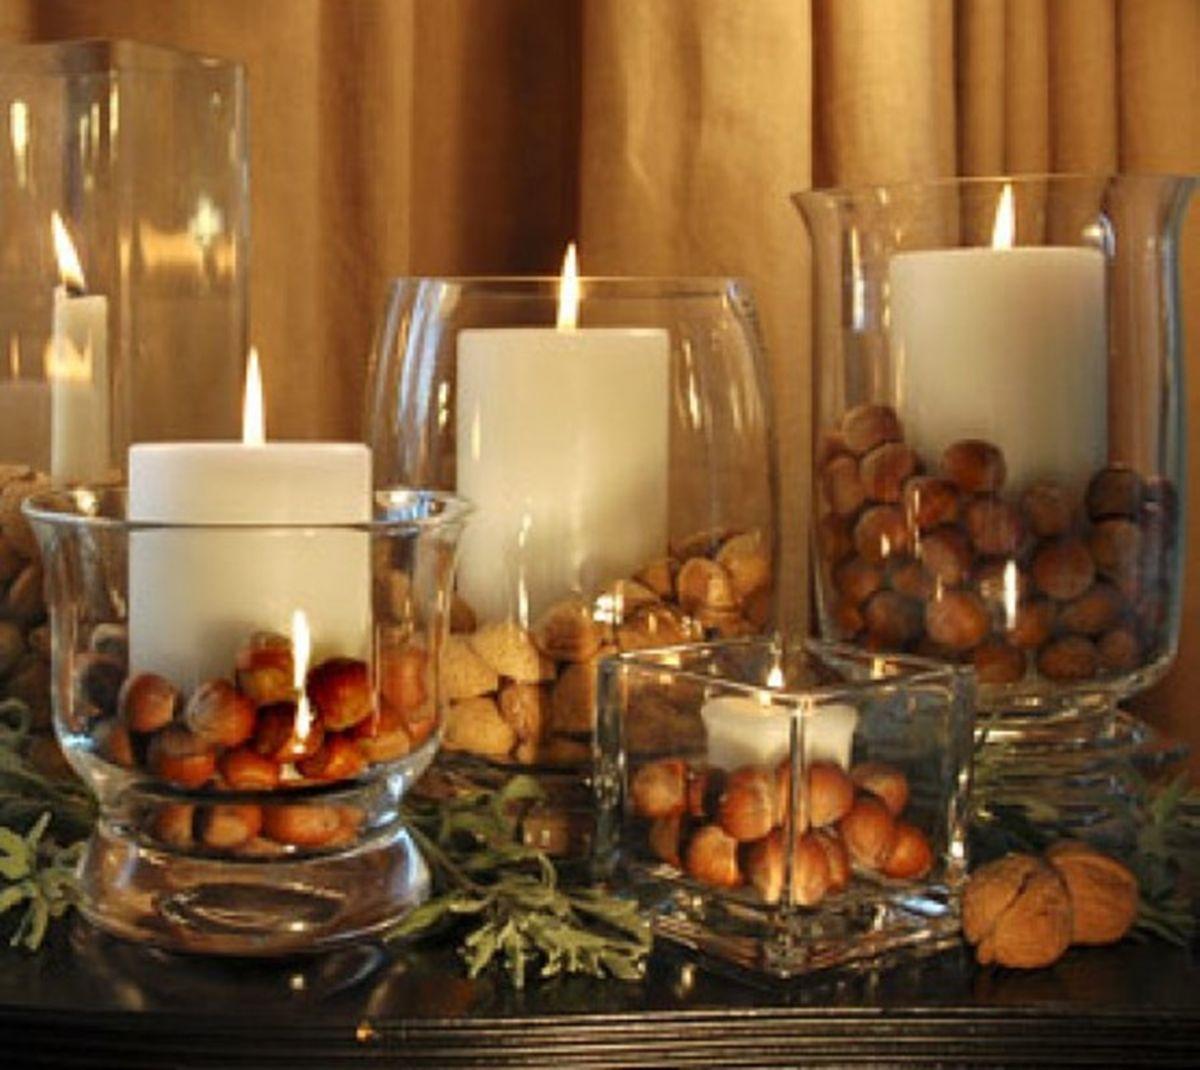 Candle Light Decor Recommendations Candle Light Decor 318